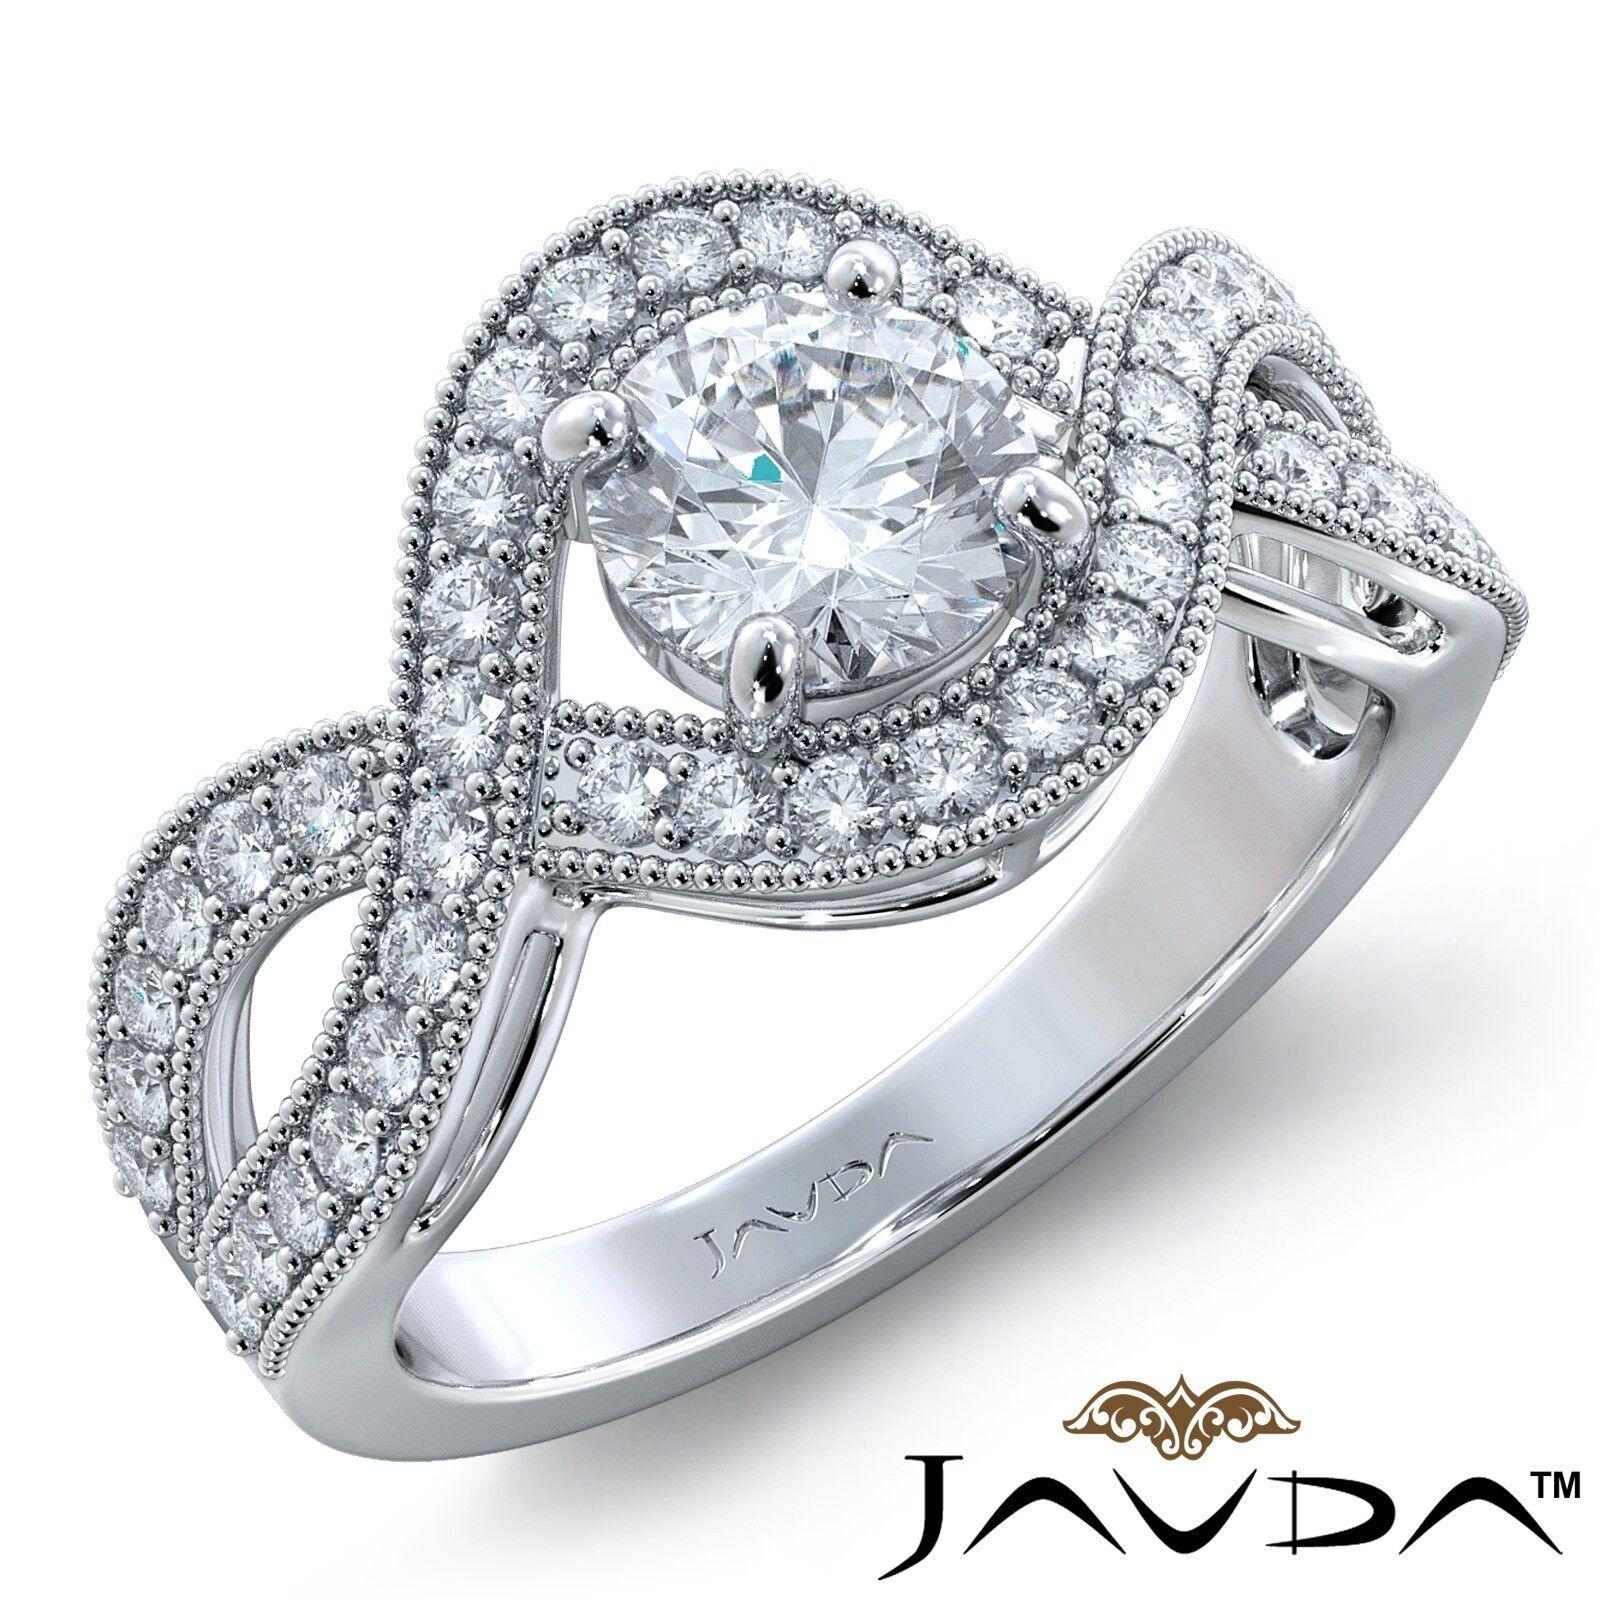 1.25ctw Milgrain Halo Side Stone Round Diamond Engagement Ring GIA D-VS2 W Gold